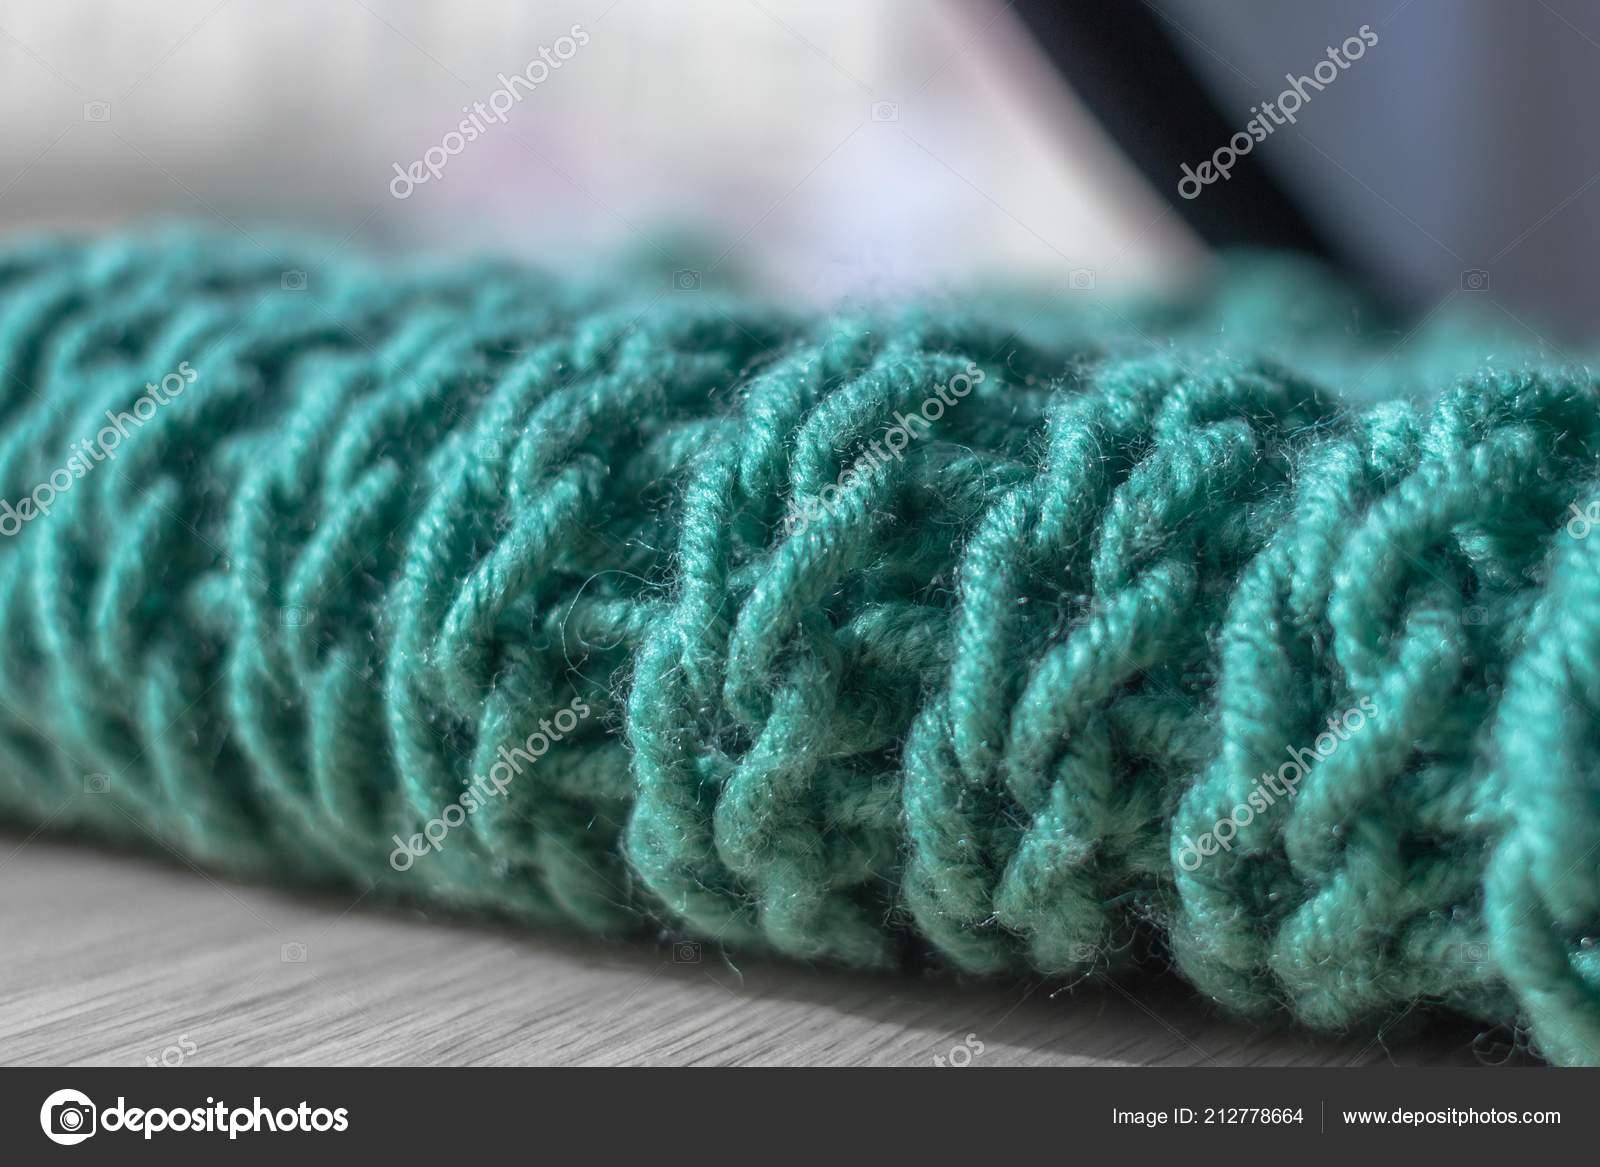 37f9105d5f Πλέξιμο Βελόνες Πλεξίματος Μια Snod Μαλλί Κασκόλ Ένα Ζεστό Πλεκτό —  Φωτογραφία Αρχείου